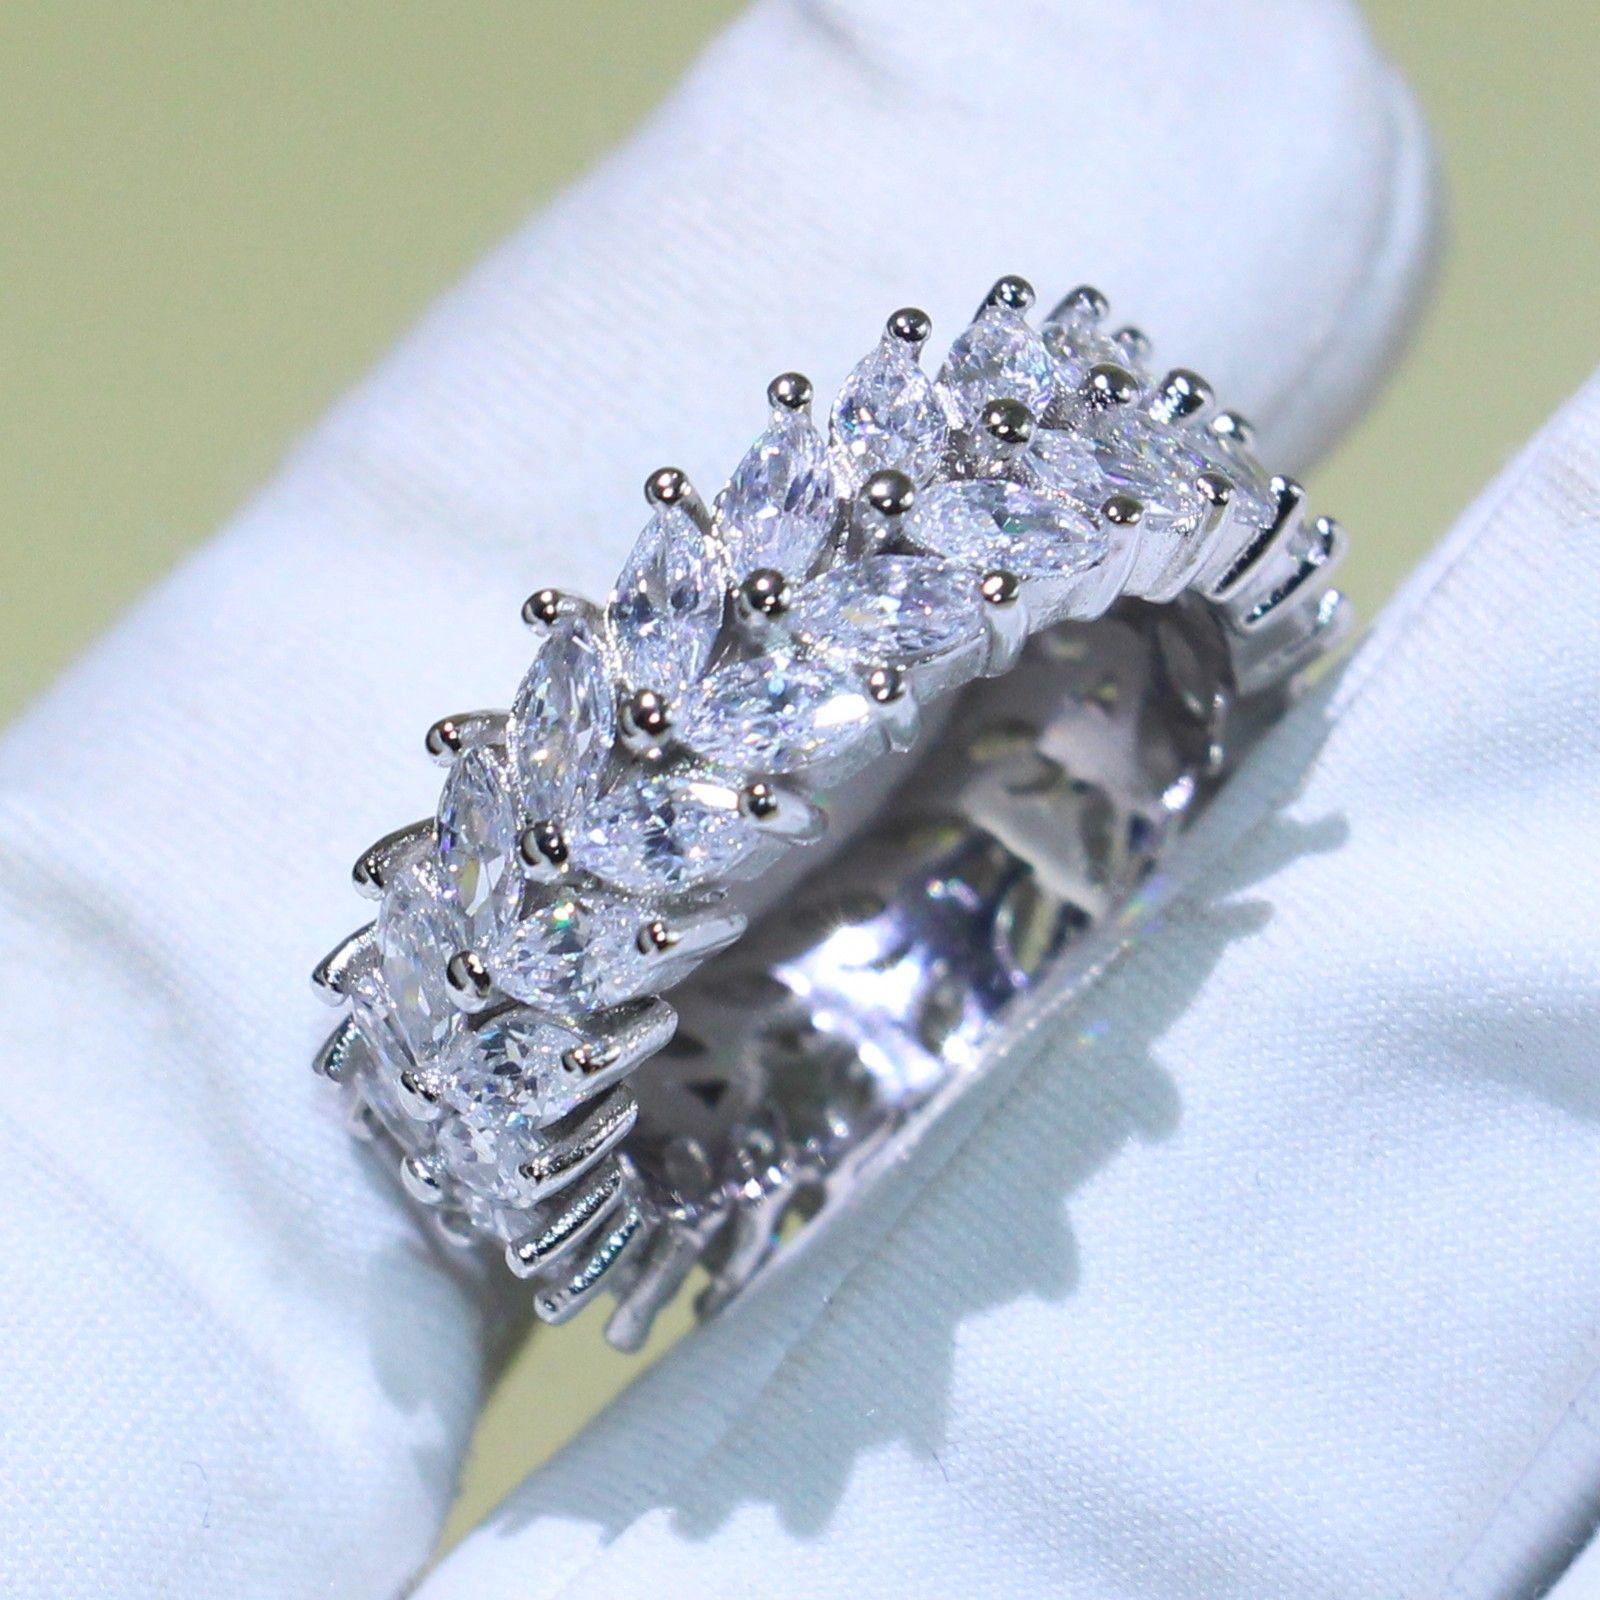 2018 Victoria Wieck Infinity Luxury Jewelry 925 Sterling Silver